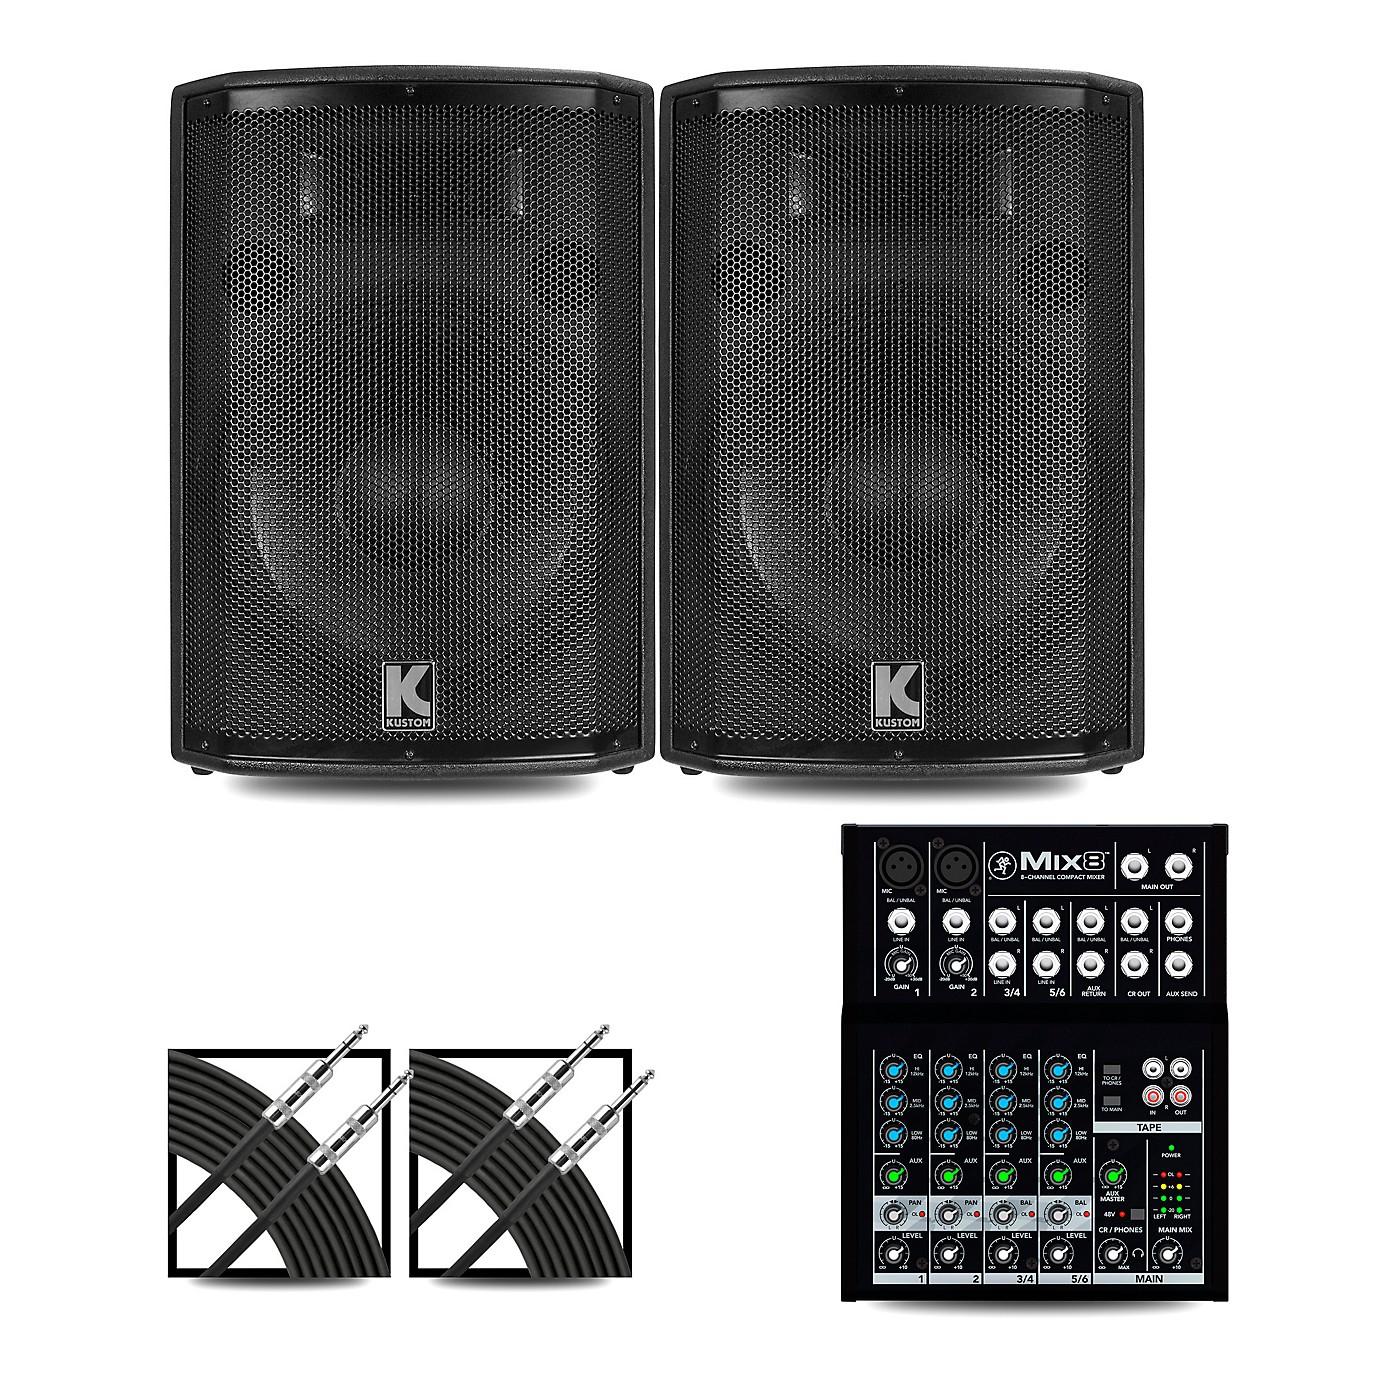 Mackie Mix8 Mixer and Kustom HiPAC Speakers thumbnail